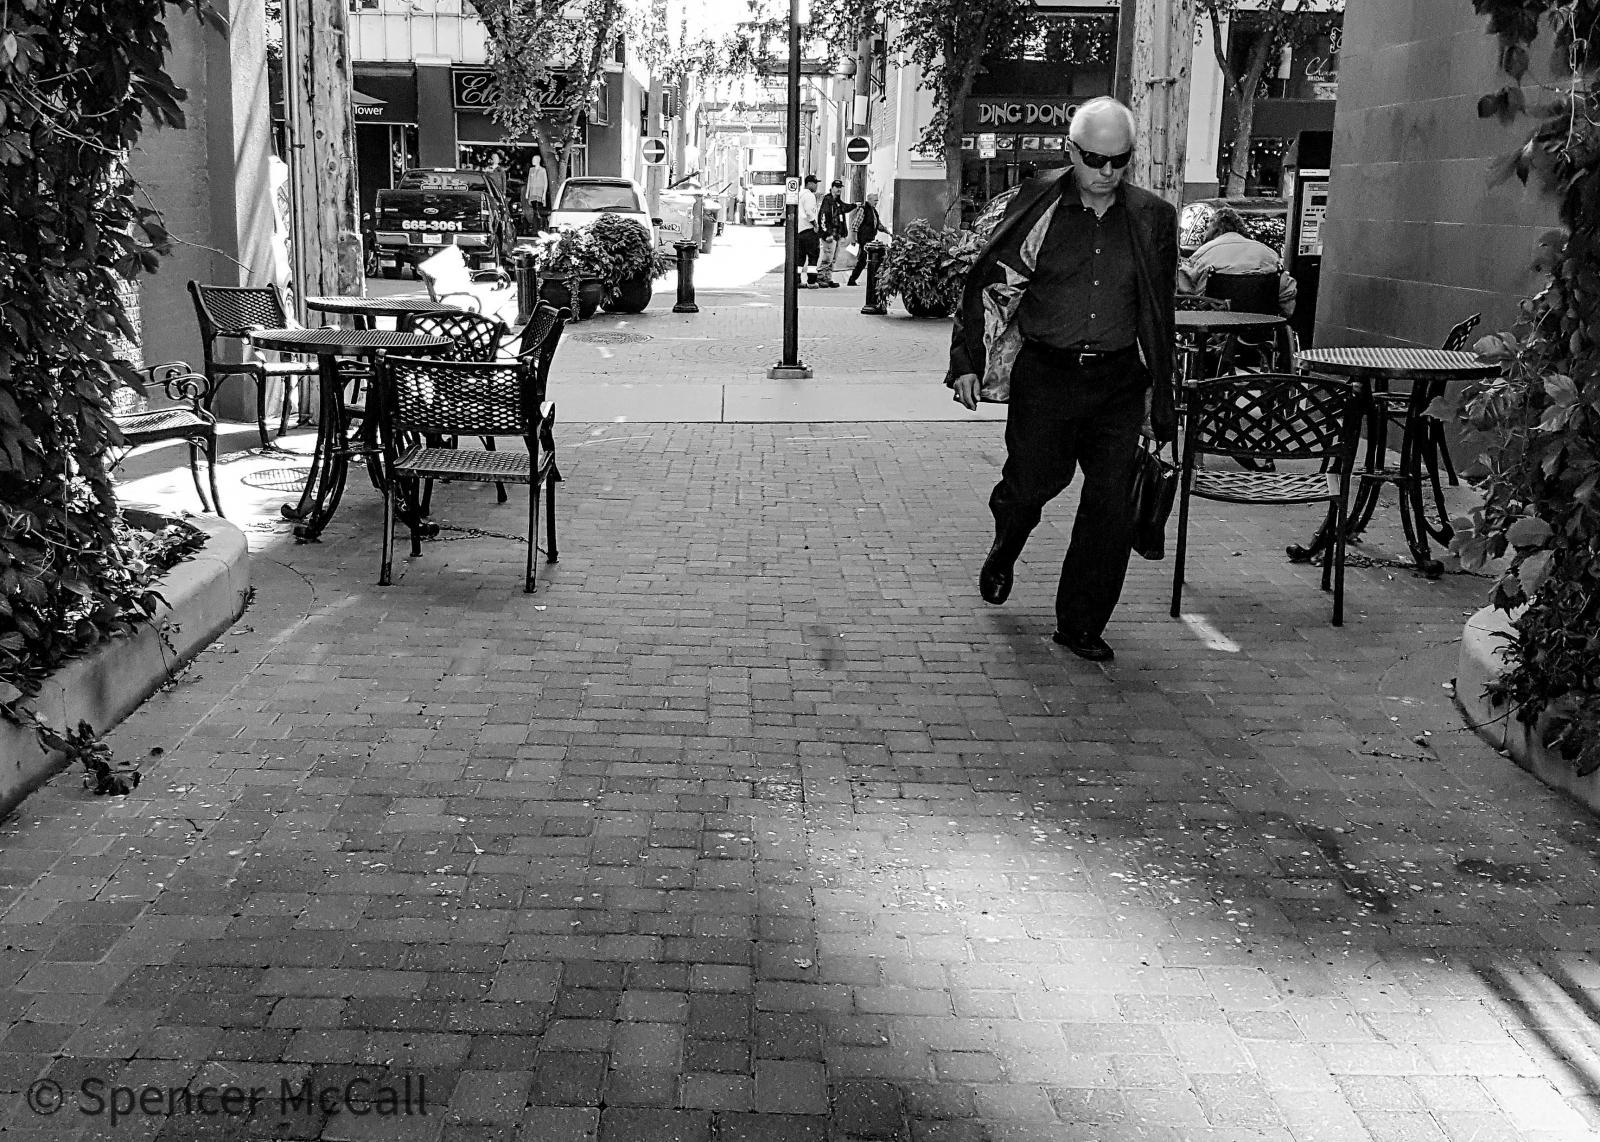 Photography image - Loading _____2021_Spencer_McCall__Public_Space__21st_Street_Saskatoon_.jpg